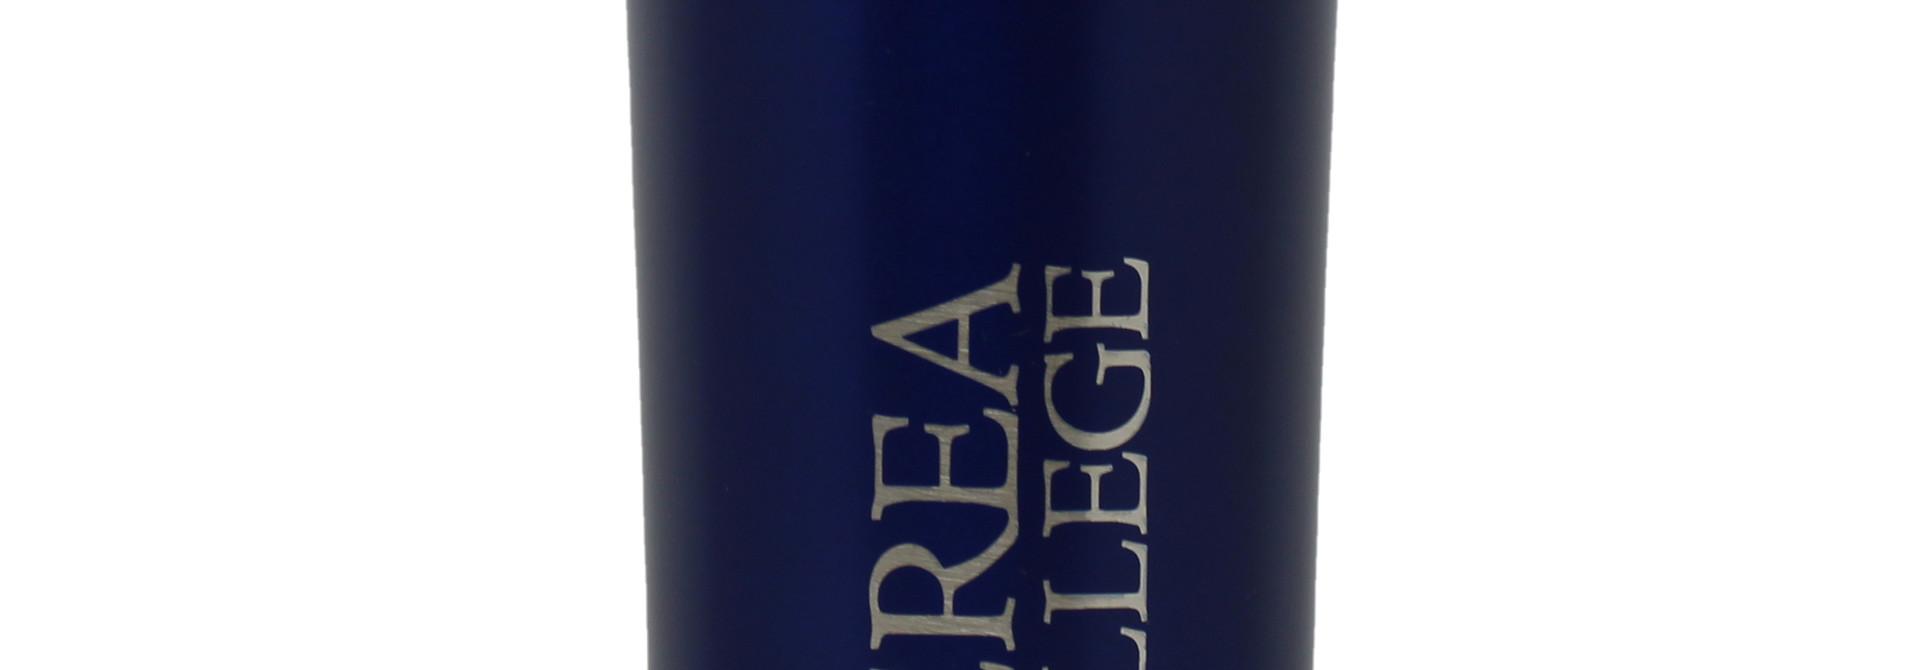 Berea College Navy Colormatch Tumbler